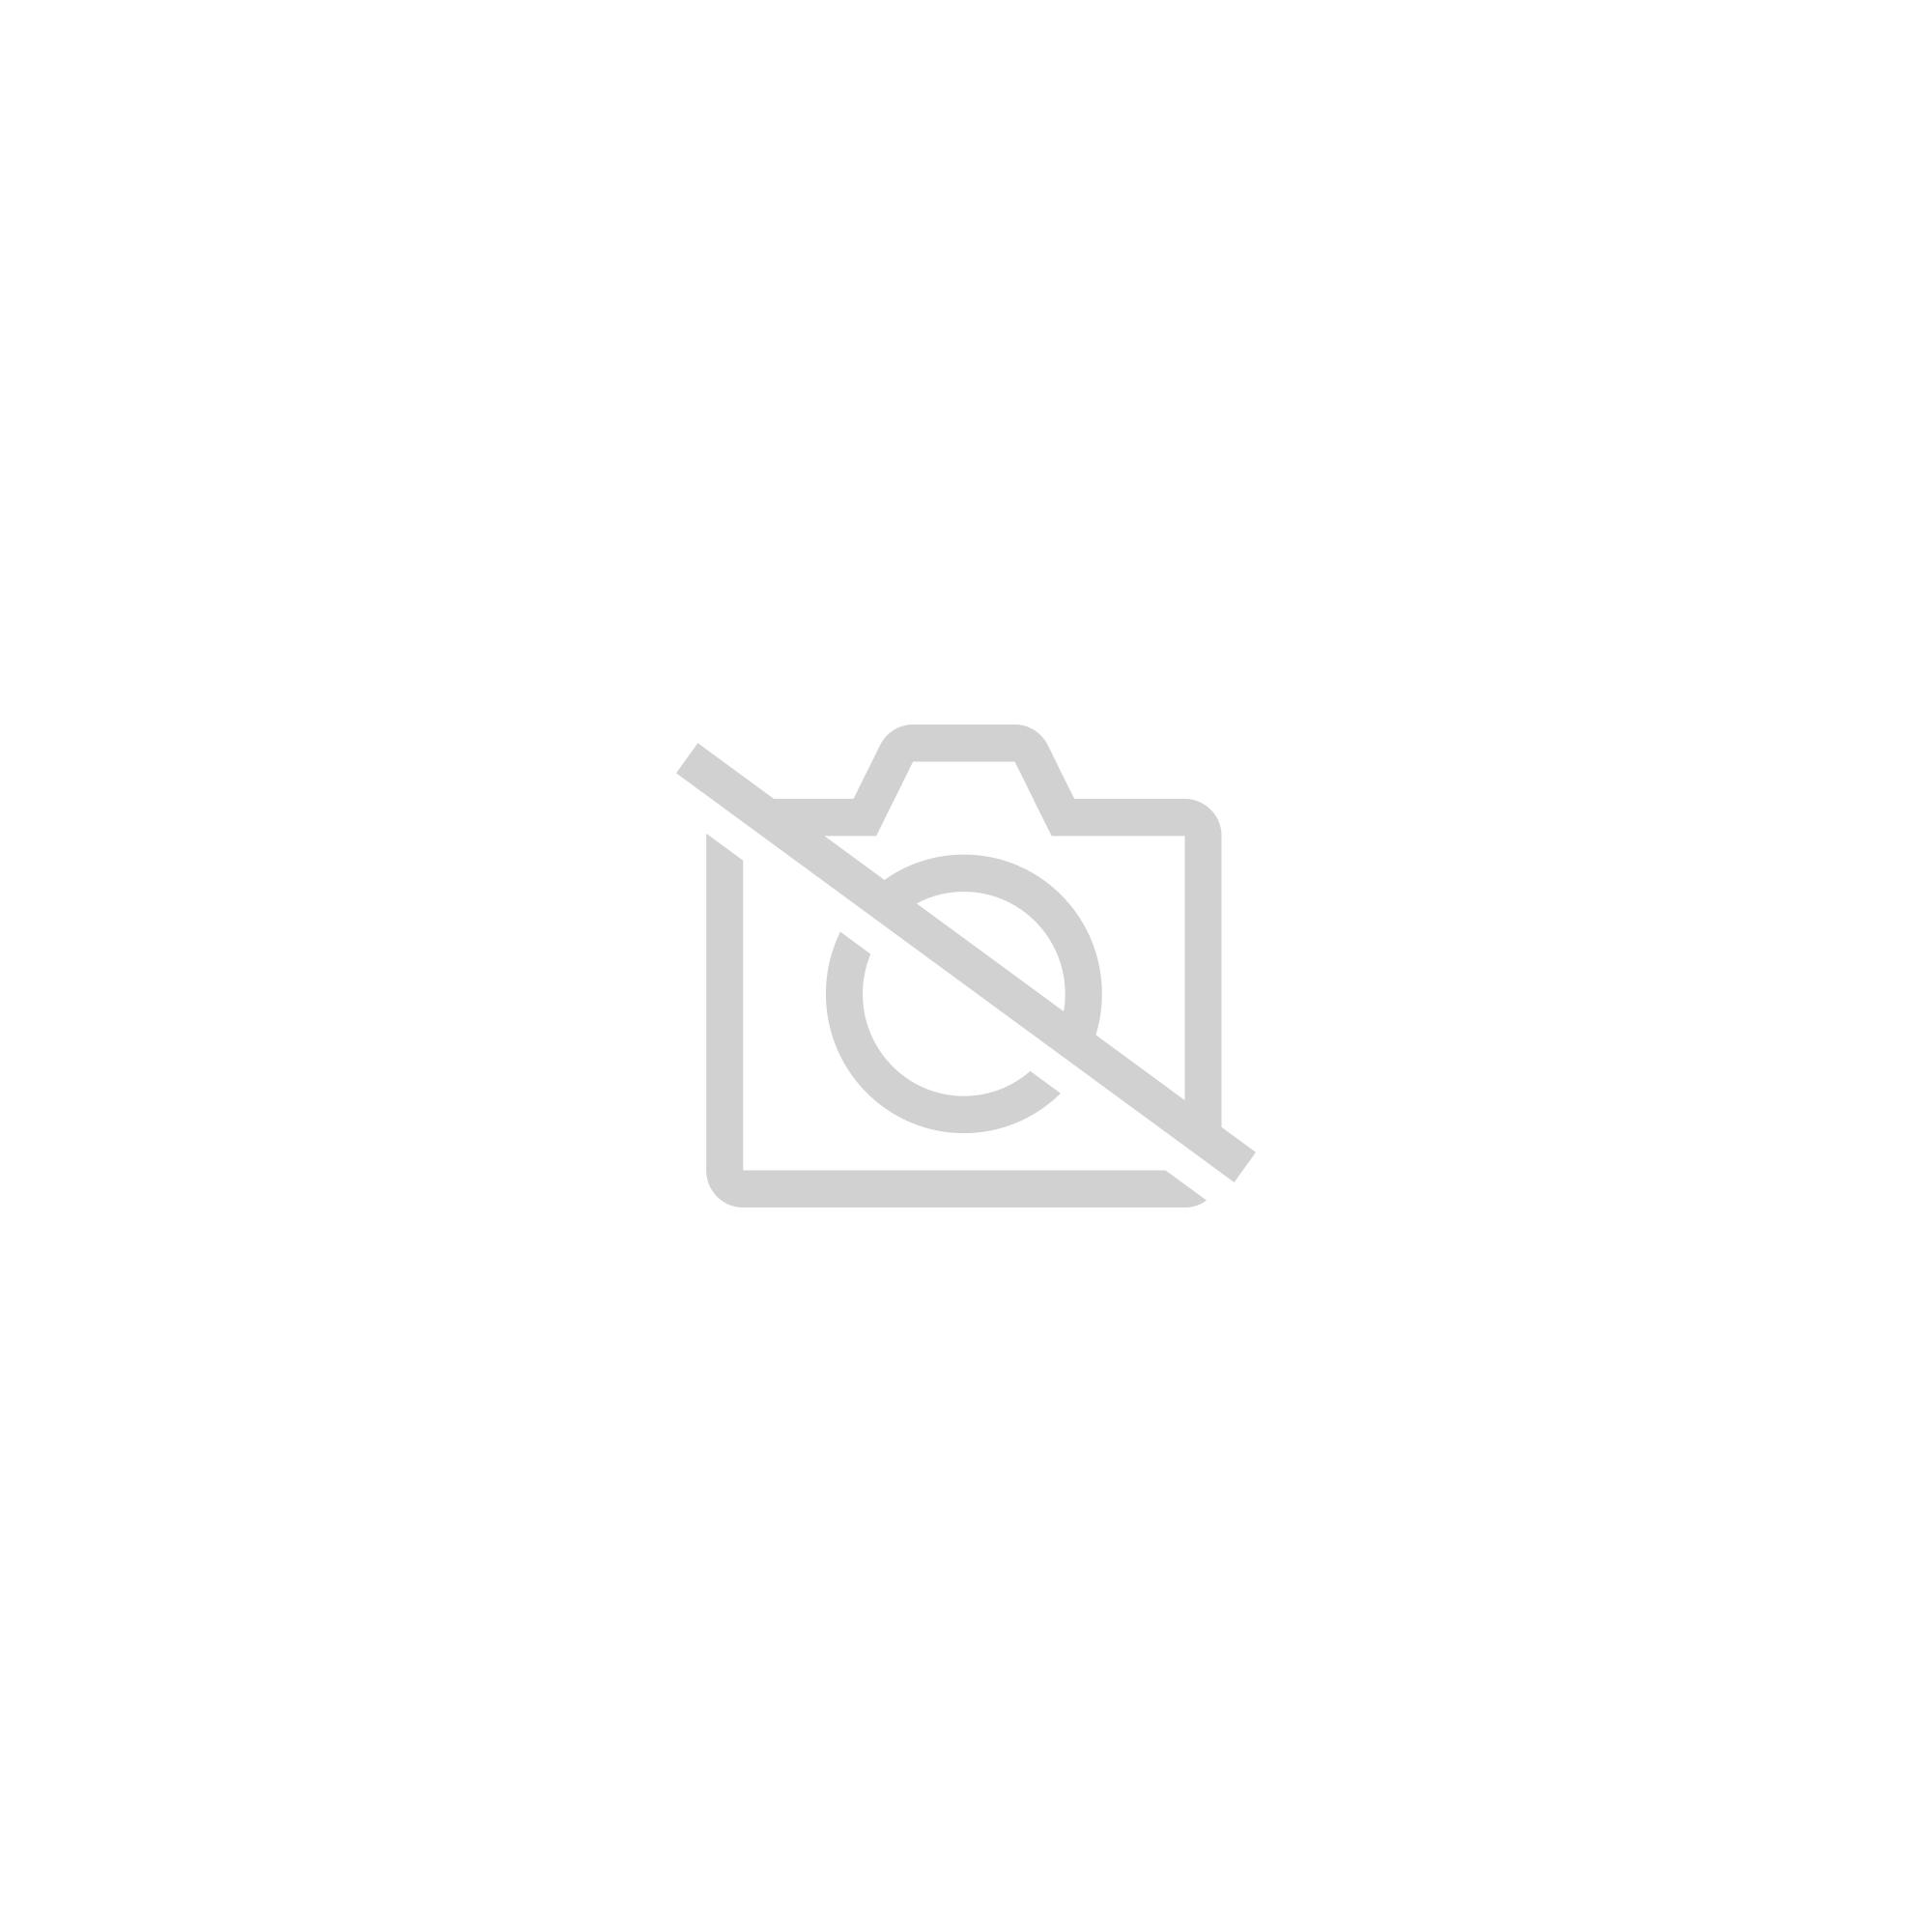 Ace 17+ Purecontrol FG Homme Chaussures Football Bleu Adidas